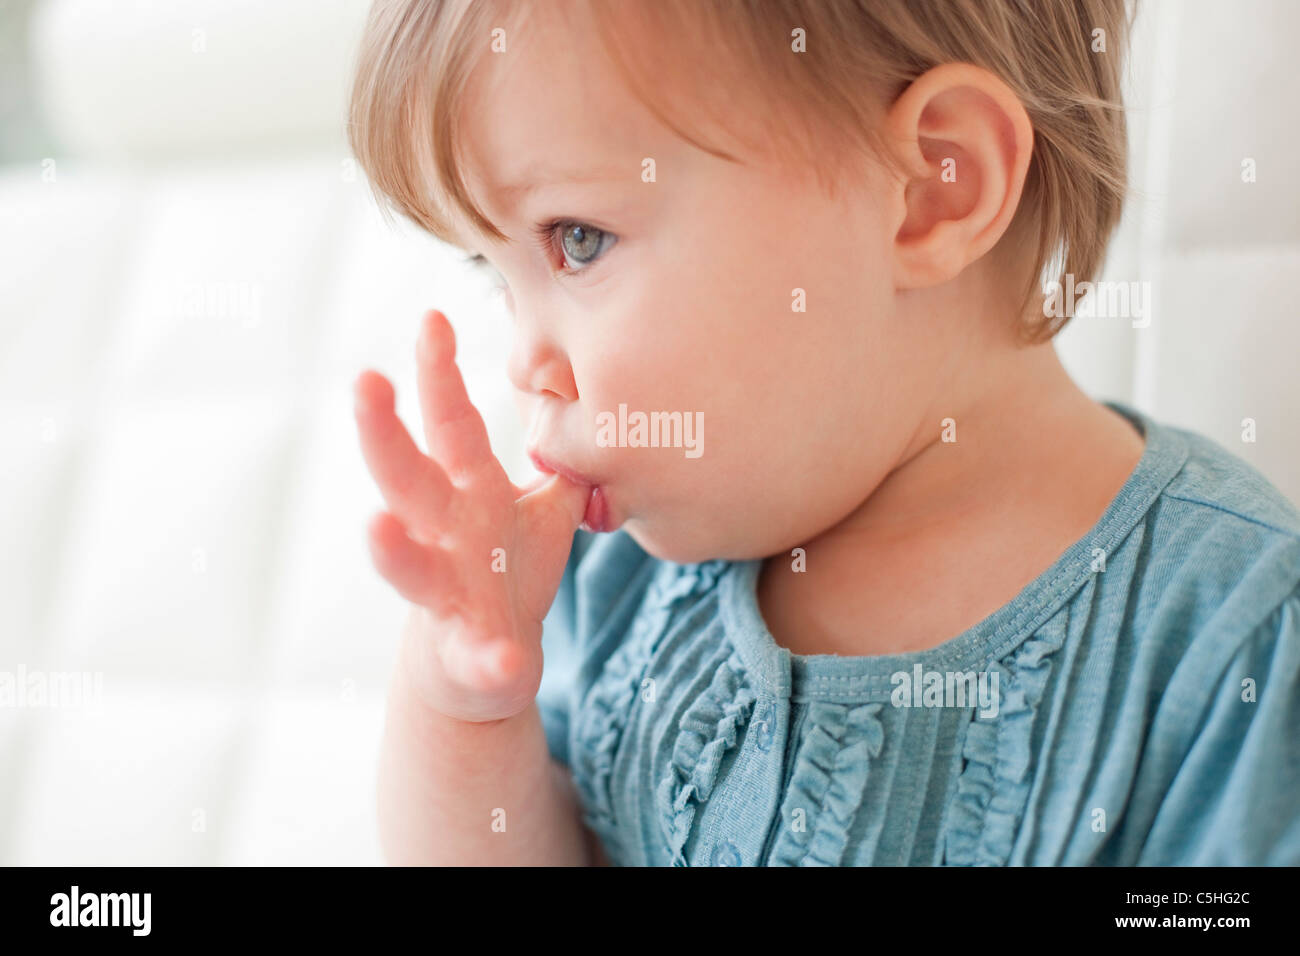 Toddler sucking her thumb - Stock Image